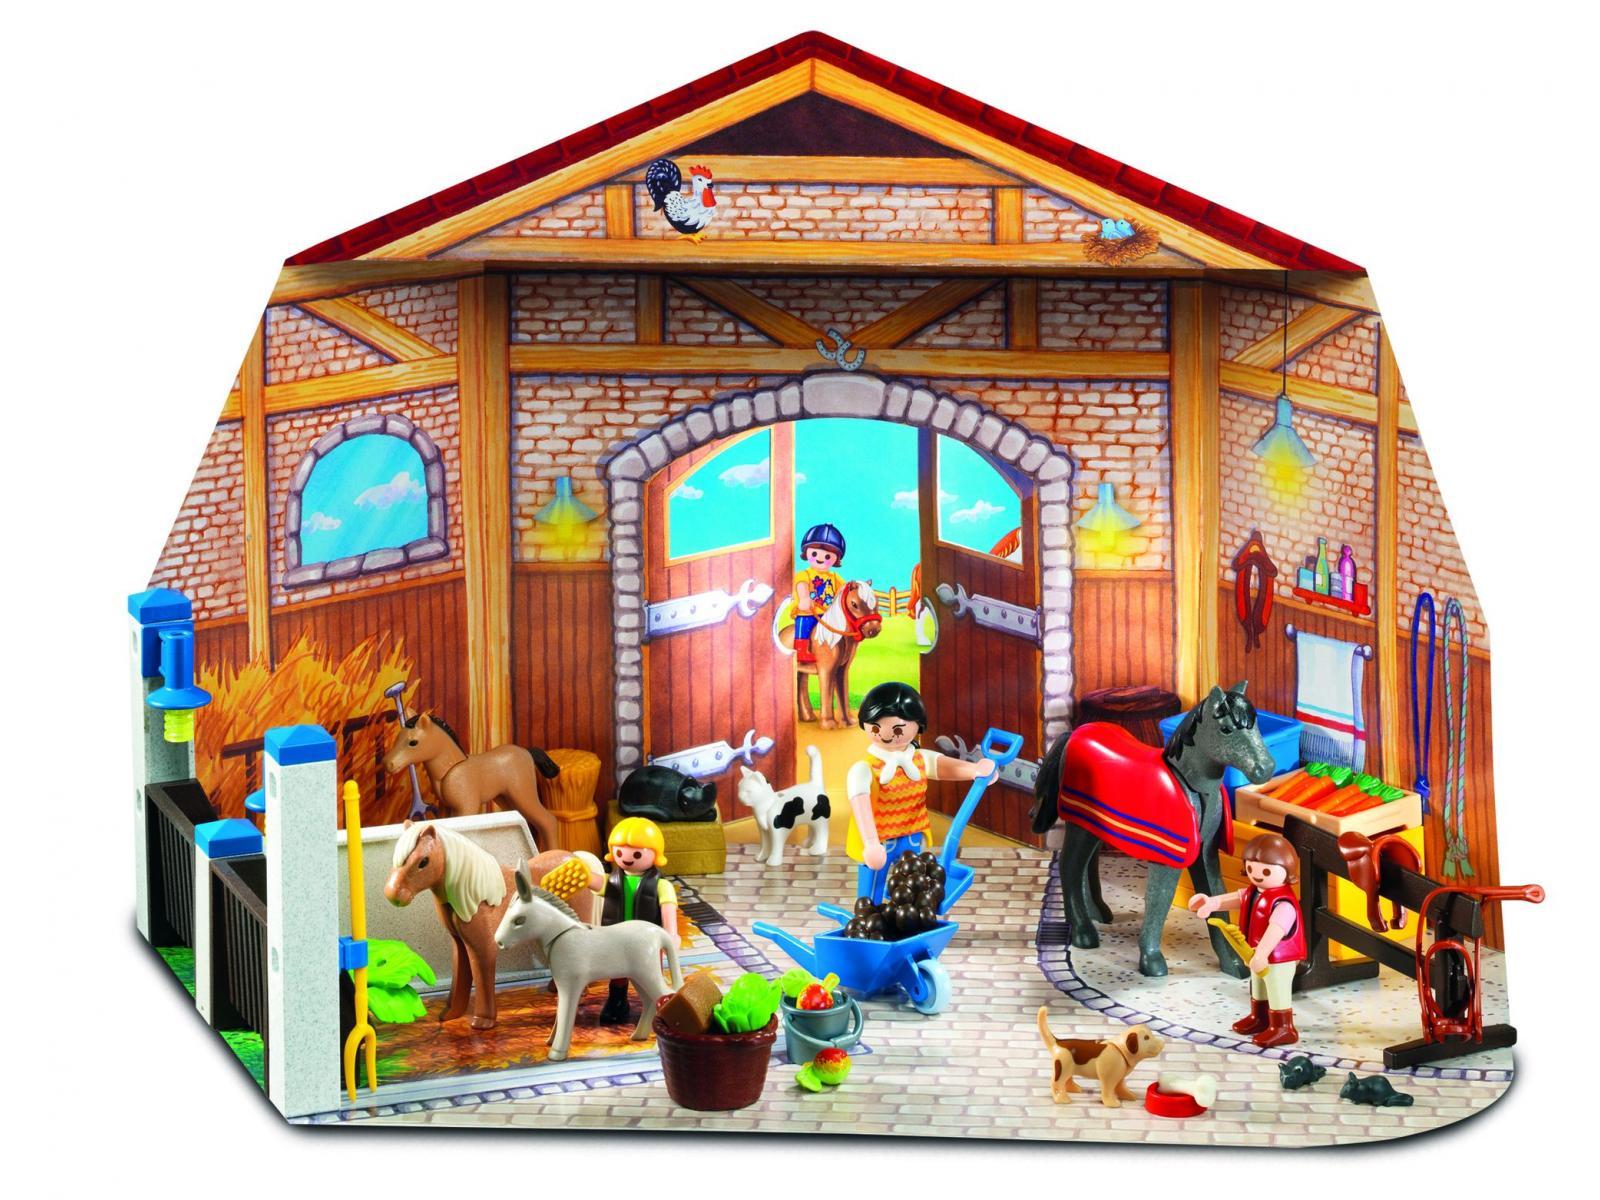 Calendrier L Avent Playmobil.4159 Calendrier De L Avent Centre Equestre